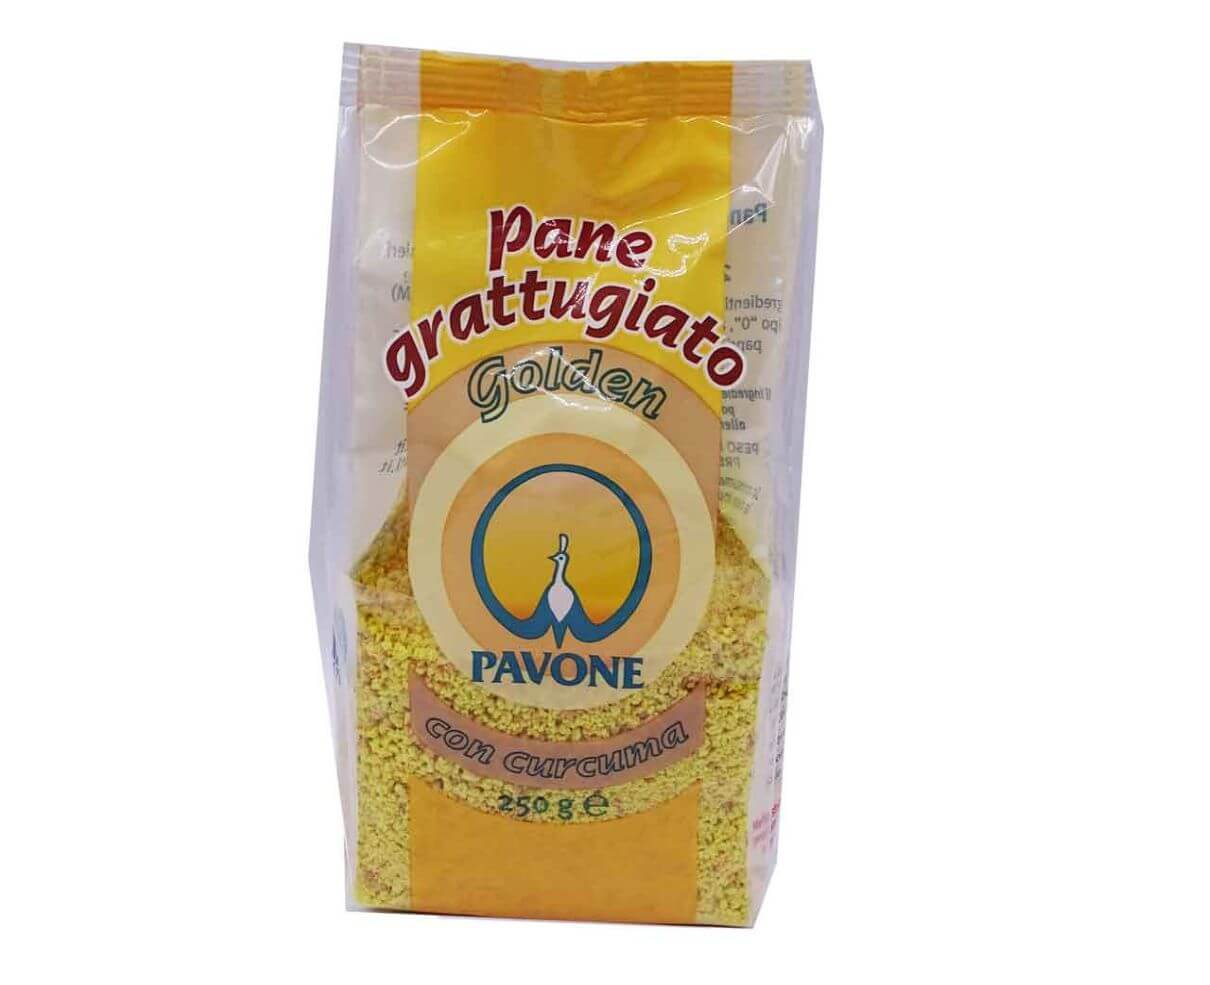 Pane grattugiato con curcuma Pavone 250gr